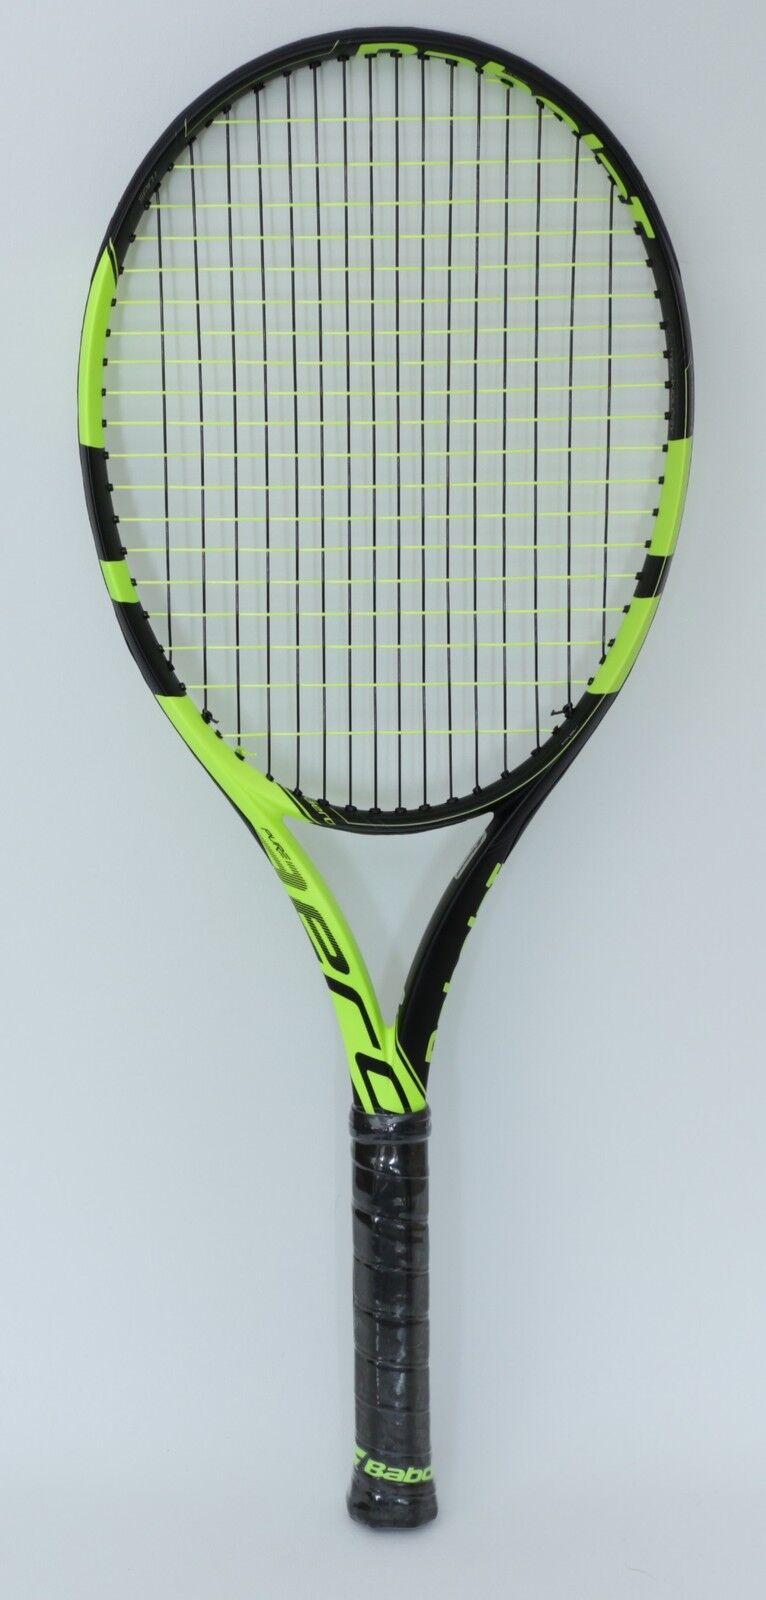 TOPAKTION  Babolat PURE AERO mit Babolat-Besaitung - Nadal Tennisschläger